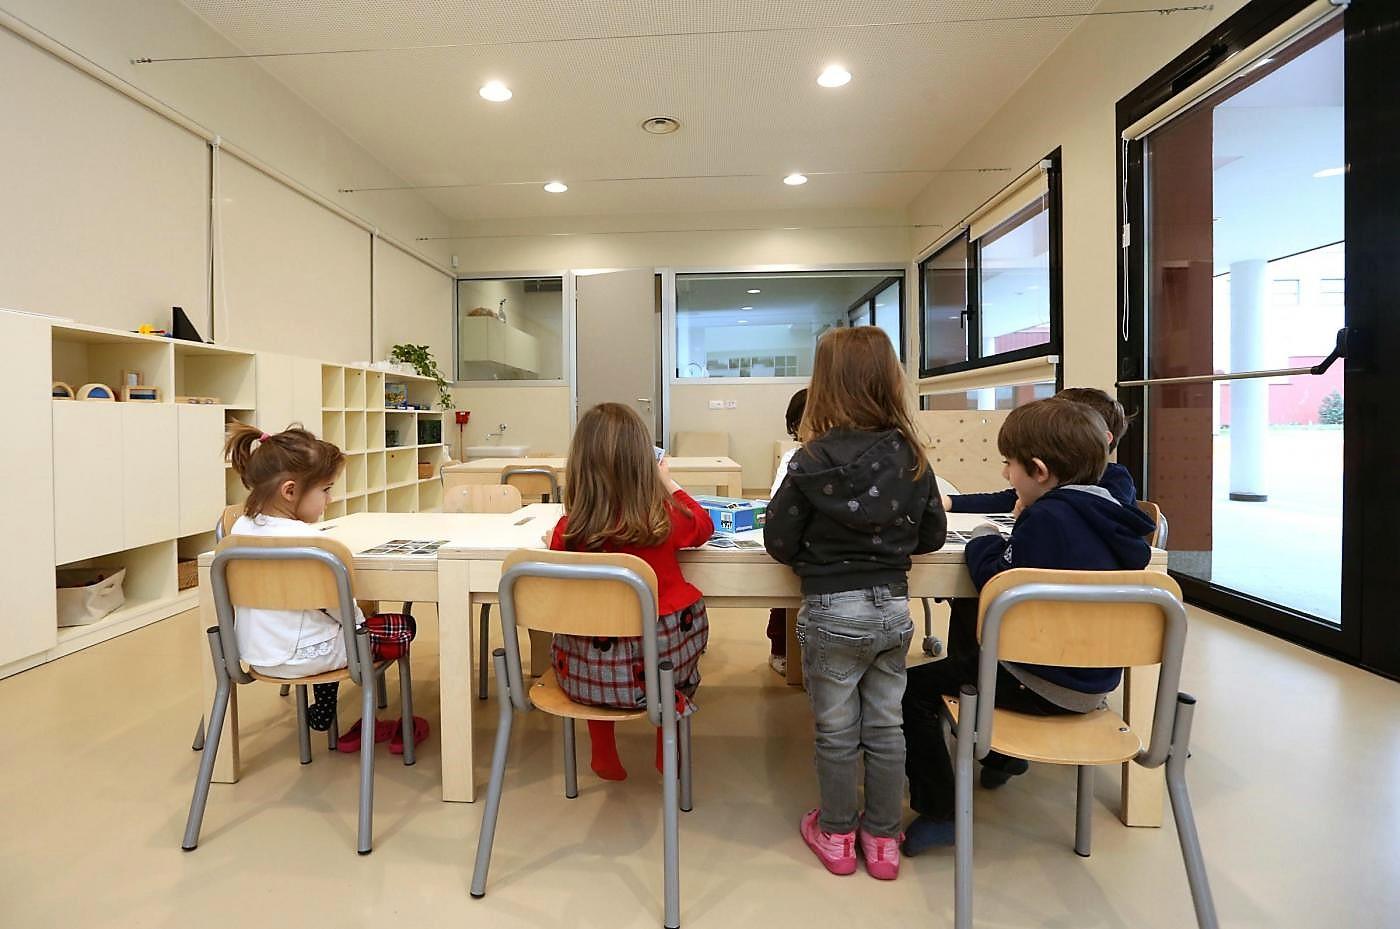 Istat conferma, mancano posti. Bonus asili fino 3.000 a famiglia